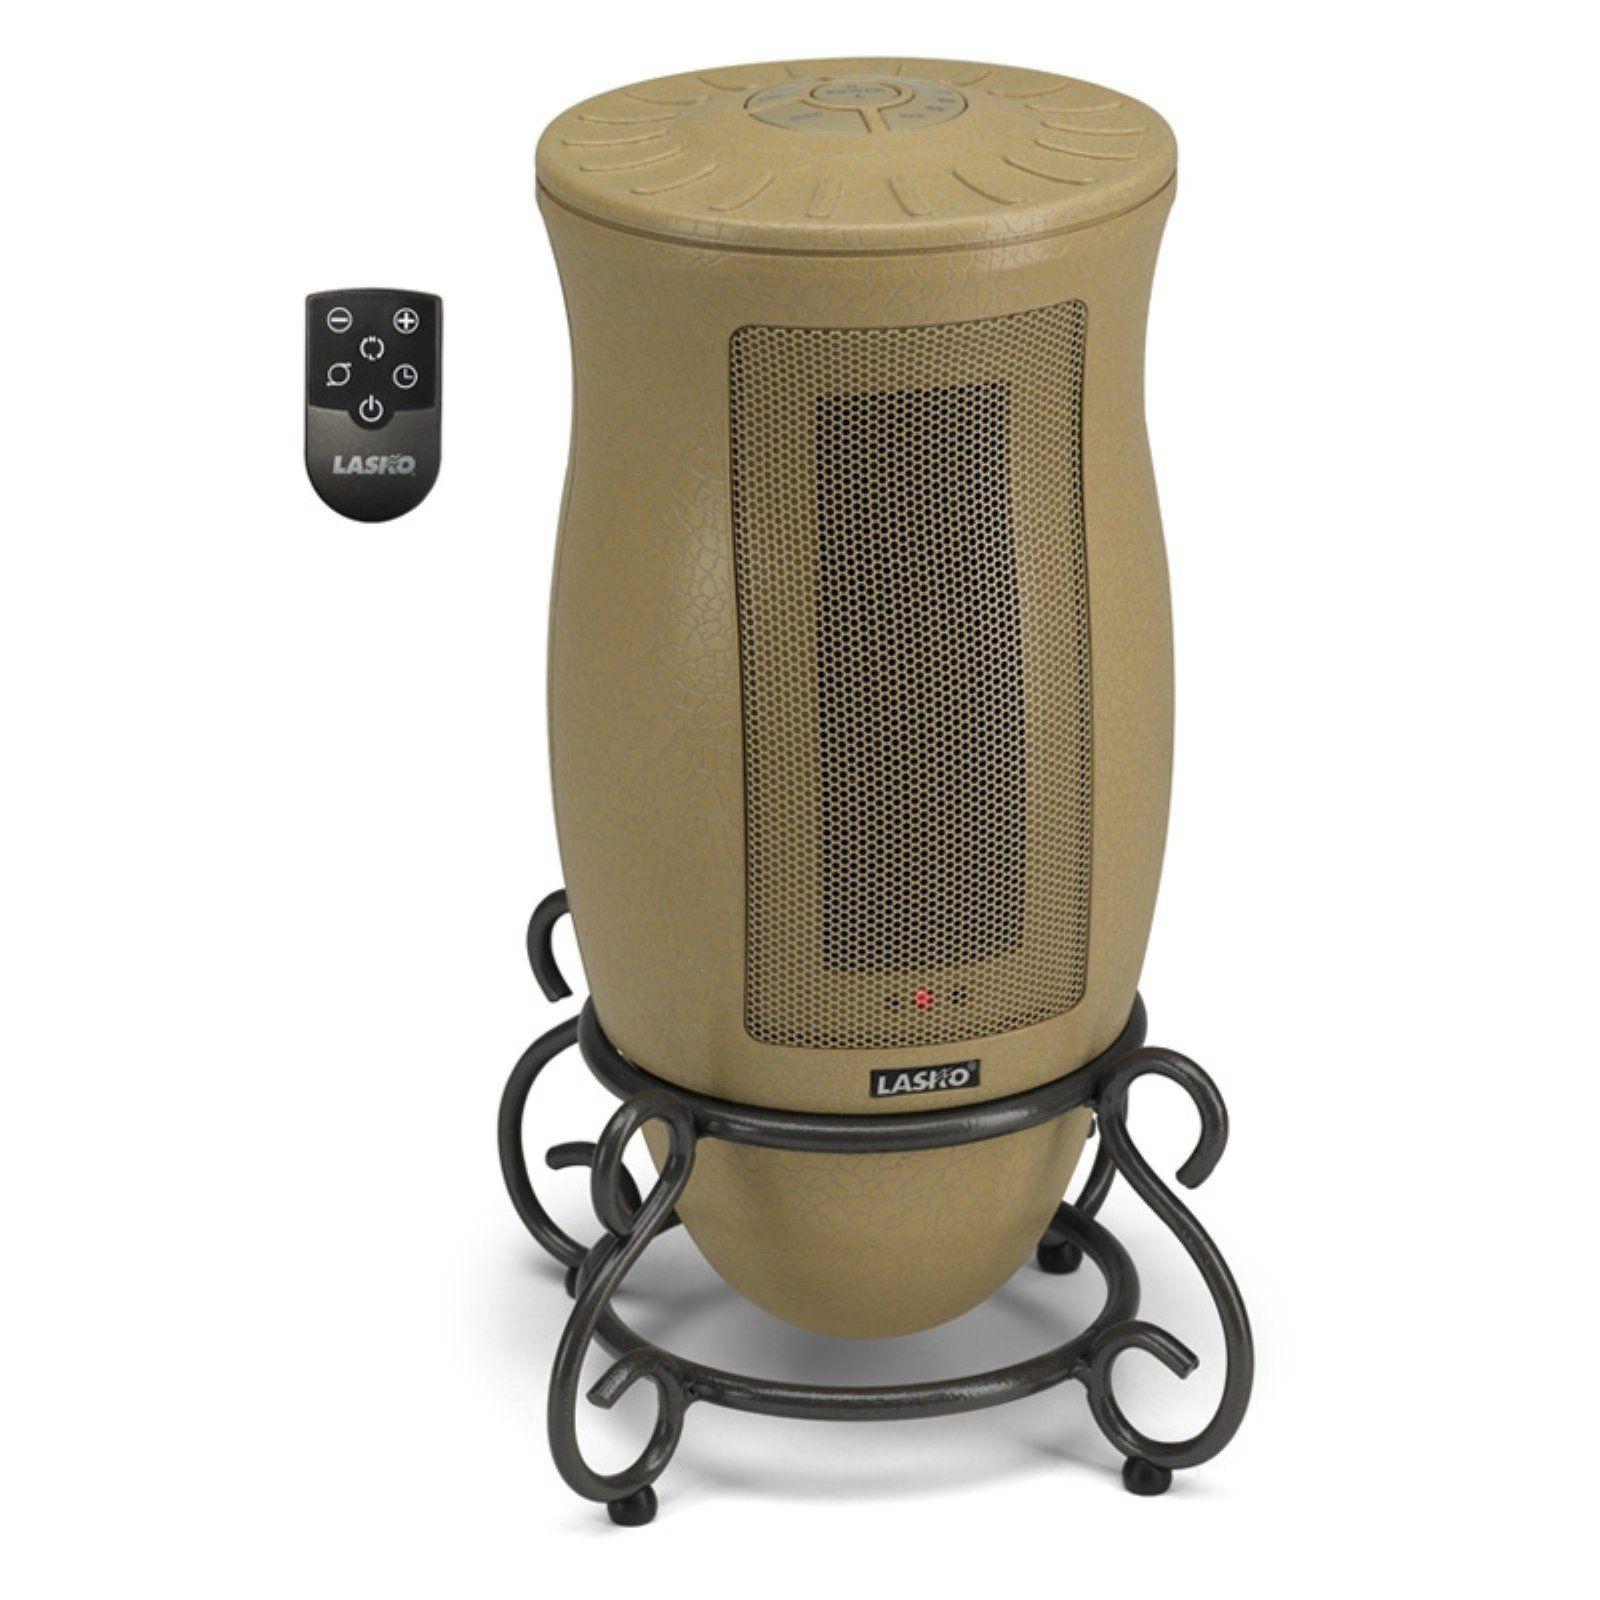 Lasko 6435 Designer Series Oscillating Ceramic Electric Space Heater Space Heater Heater